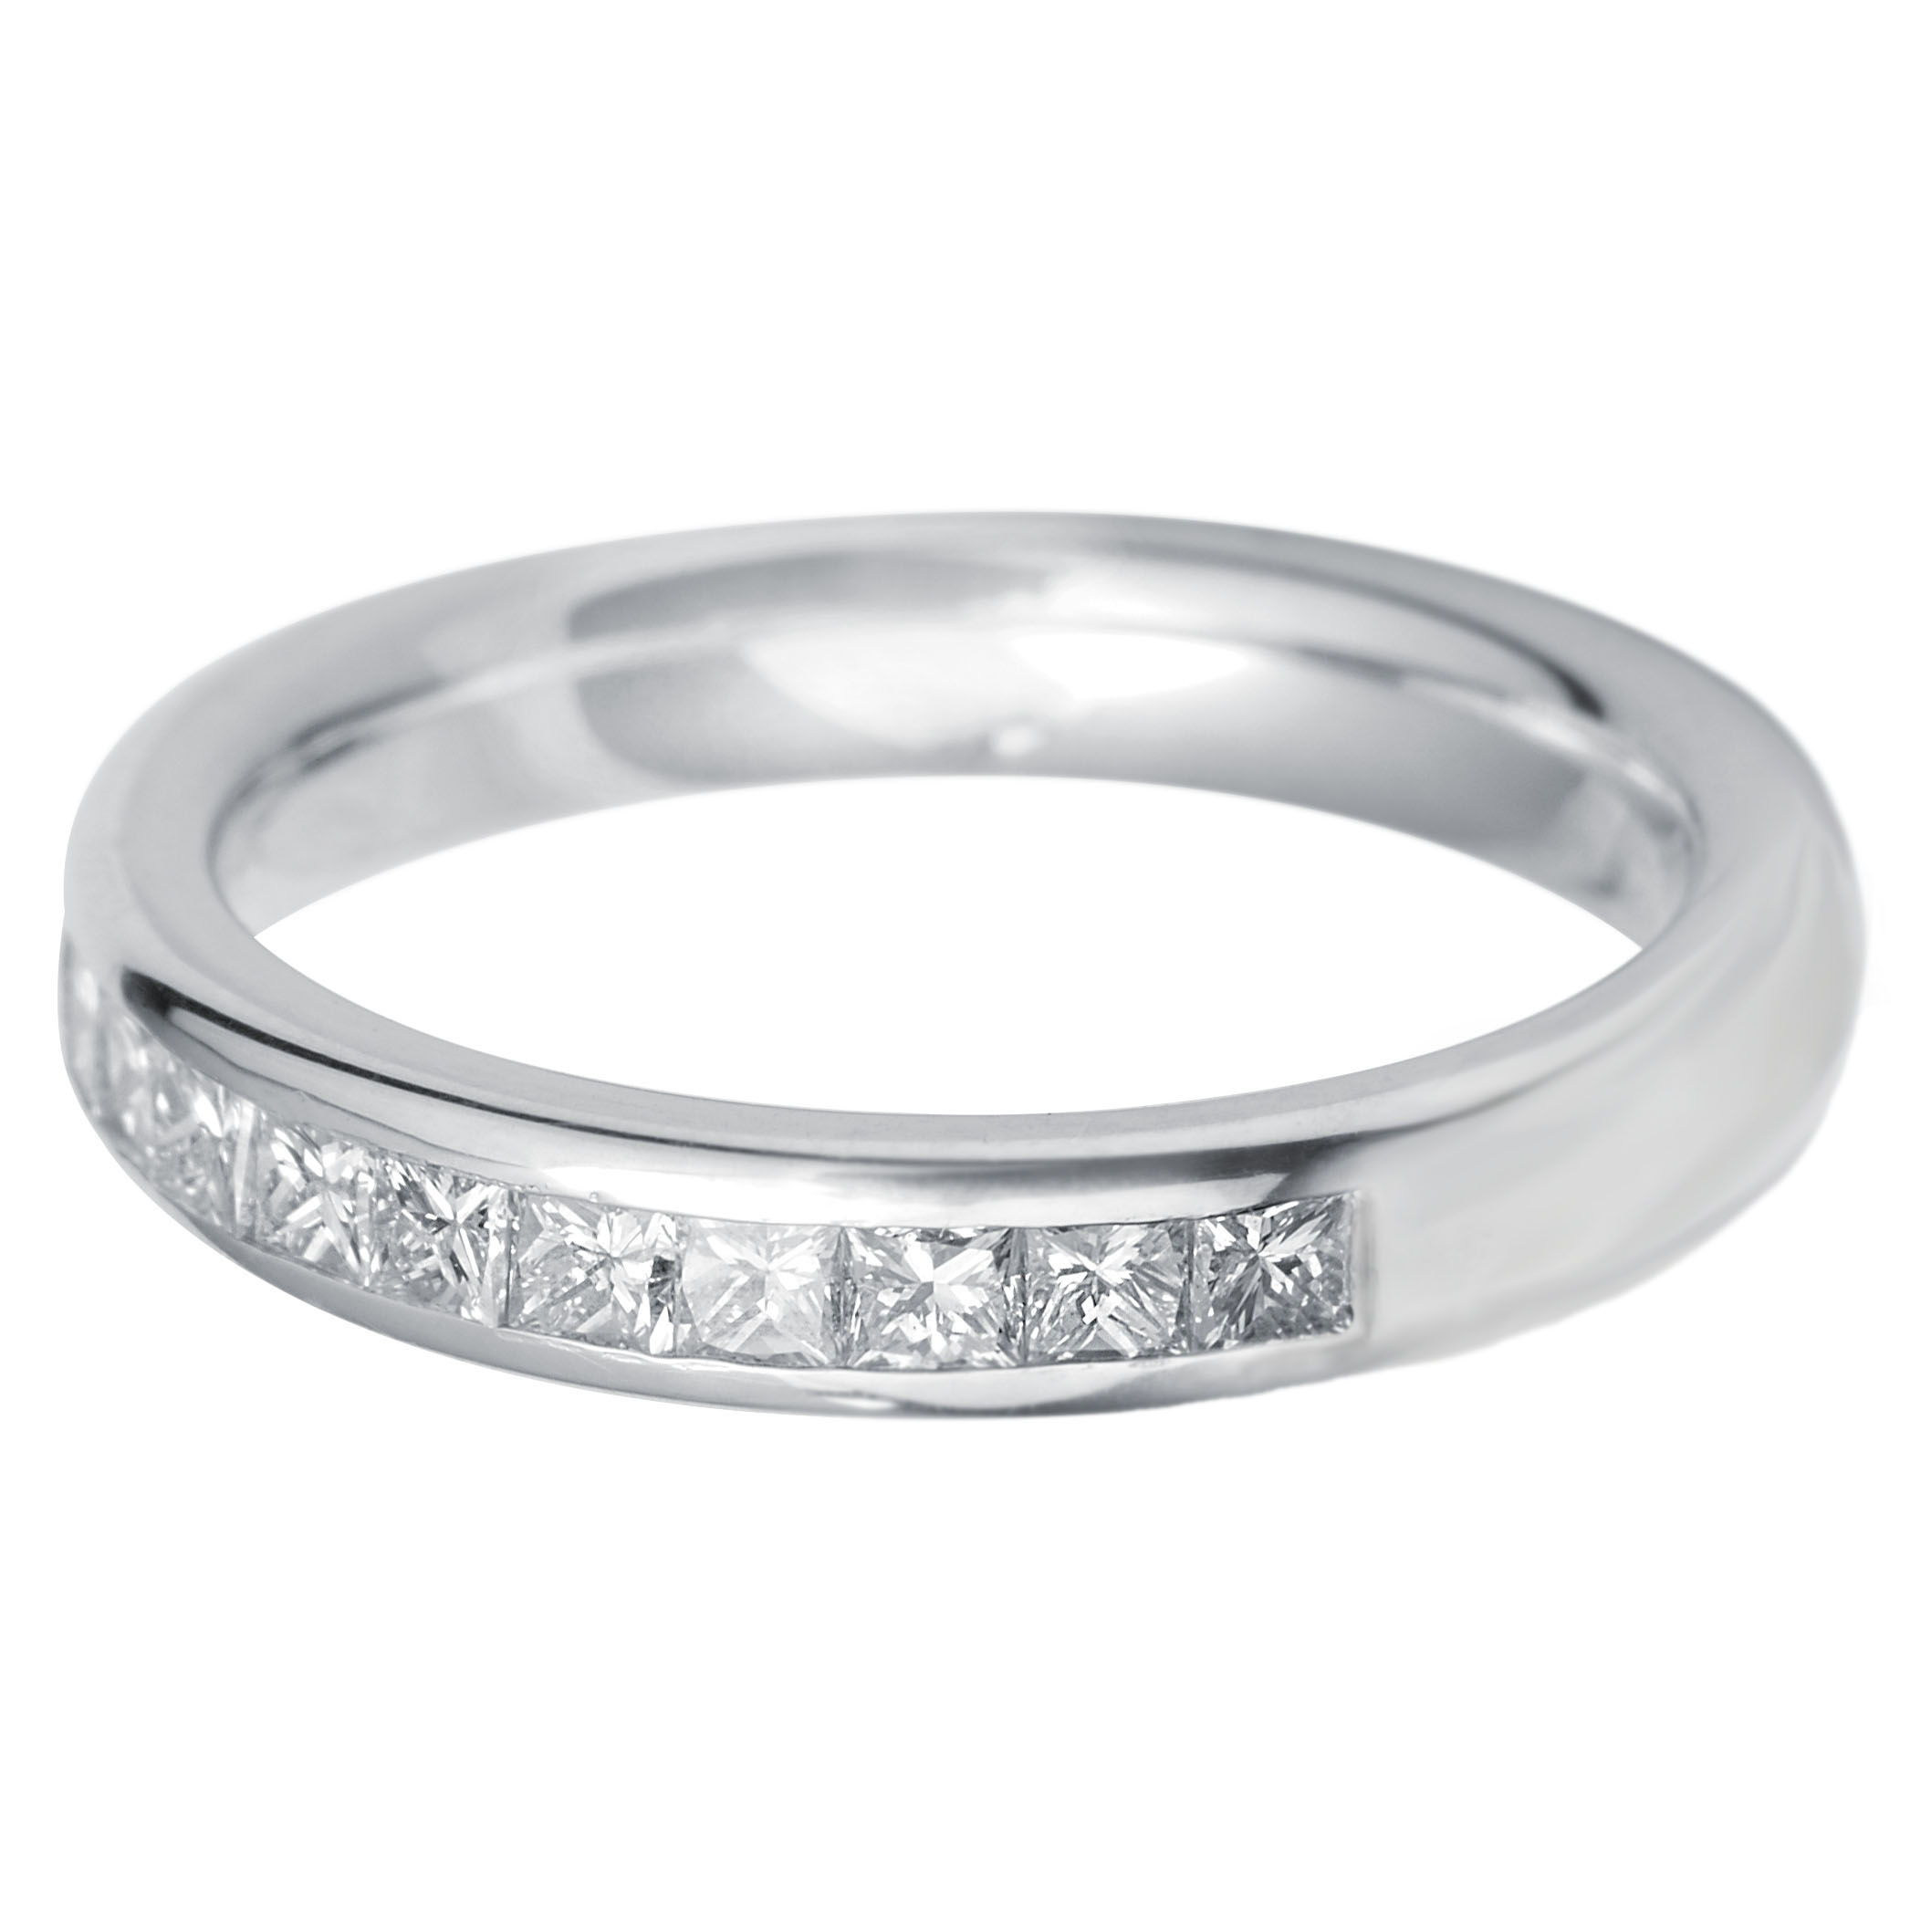 Williamson Brown 0.5ct Diamond Eternity Ring